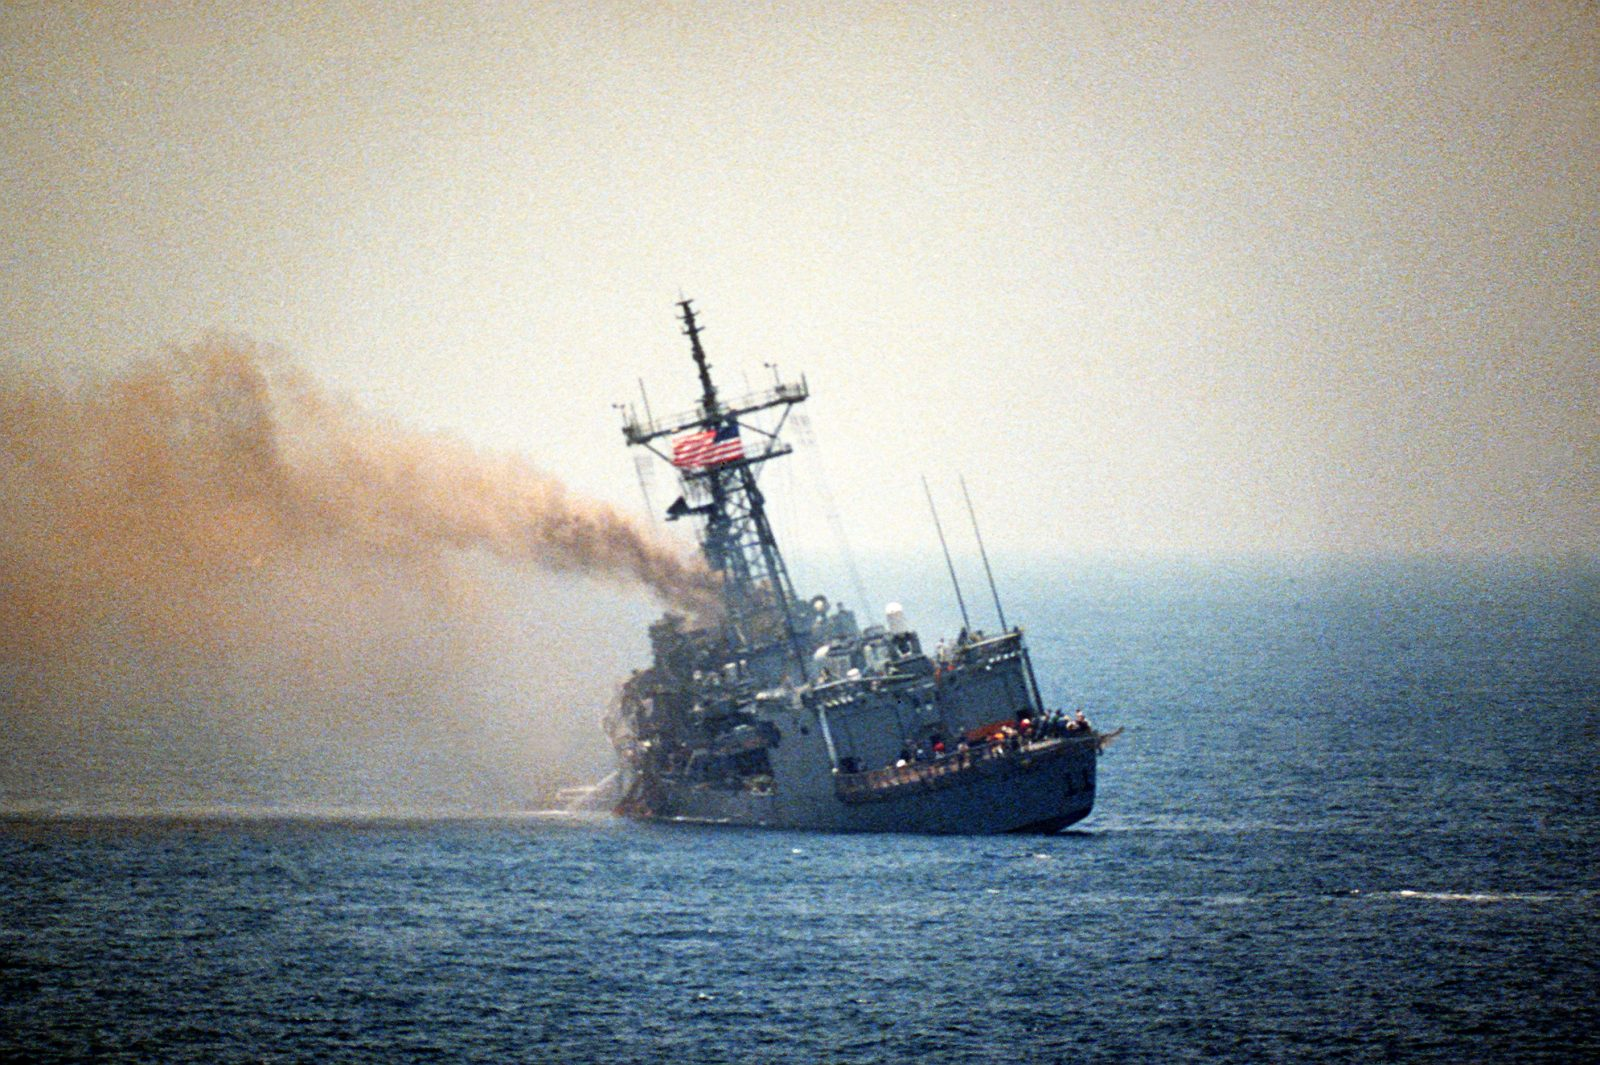 When Iraqi jet Aircraft Struck an American Frigate USS Stark and Killed 37 Sailors b